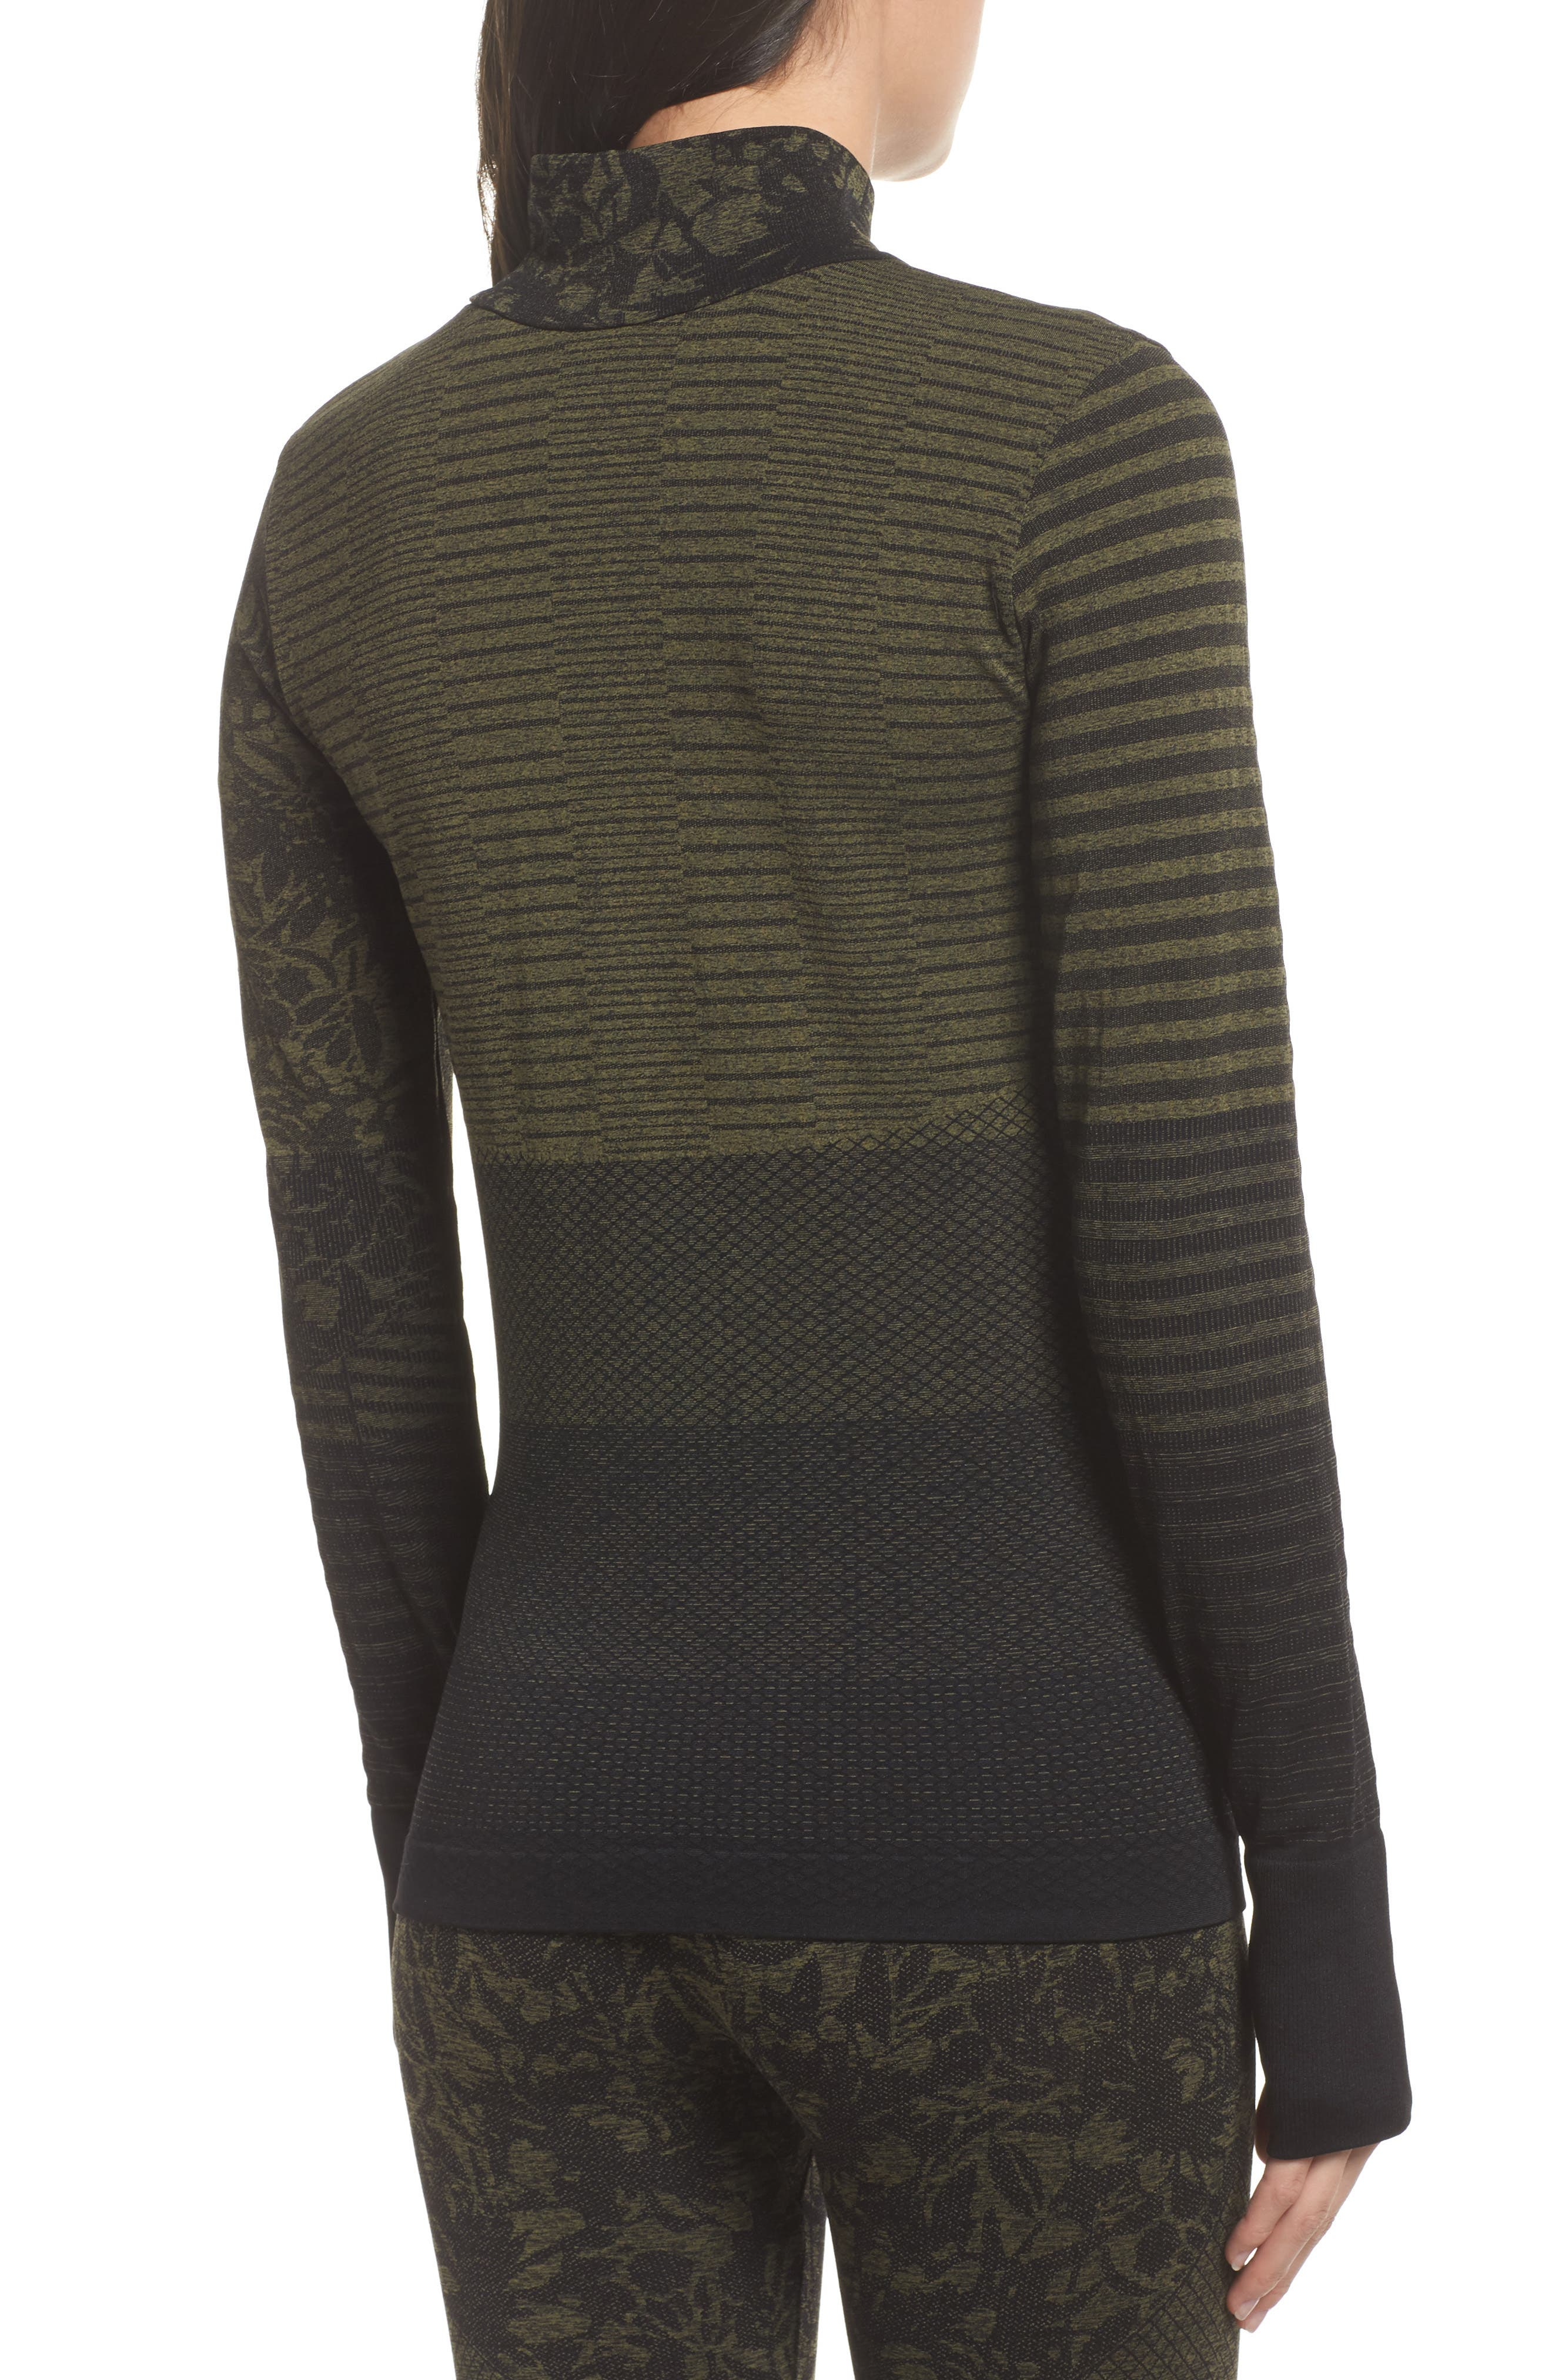 Vitality Quarter Zip Pullover,                             Alternate thumbnail 2, color,                             Deep Lichen Green/ Black